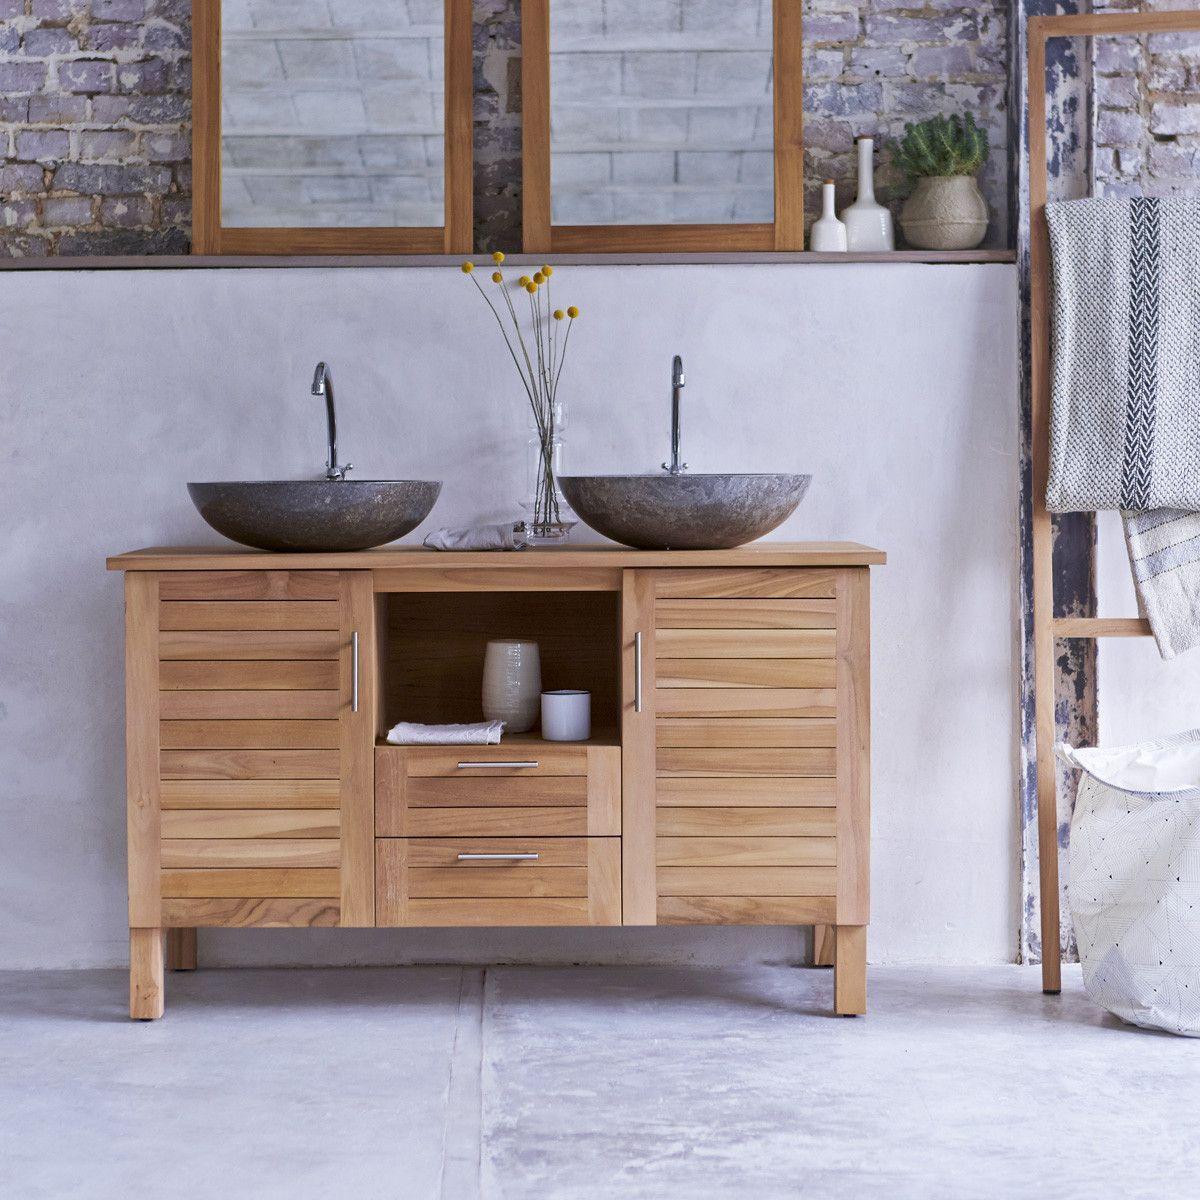 Solid Teak Wood Vanity Cabinet Wash Stand Adjustable Drawers Bathroom Furniture Adjustable Bathroom Cabinet Dra In 2020 Teak Bathroom Bathroom Furniture Teak Vanity